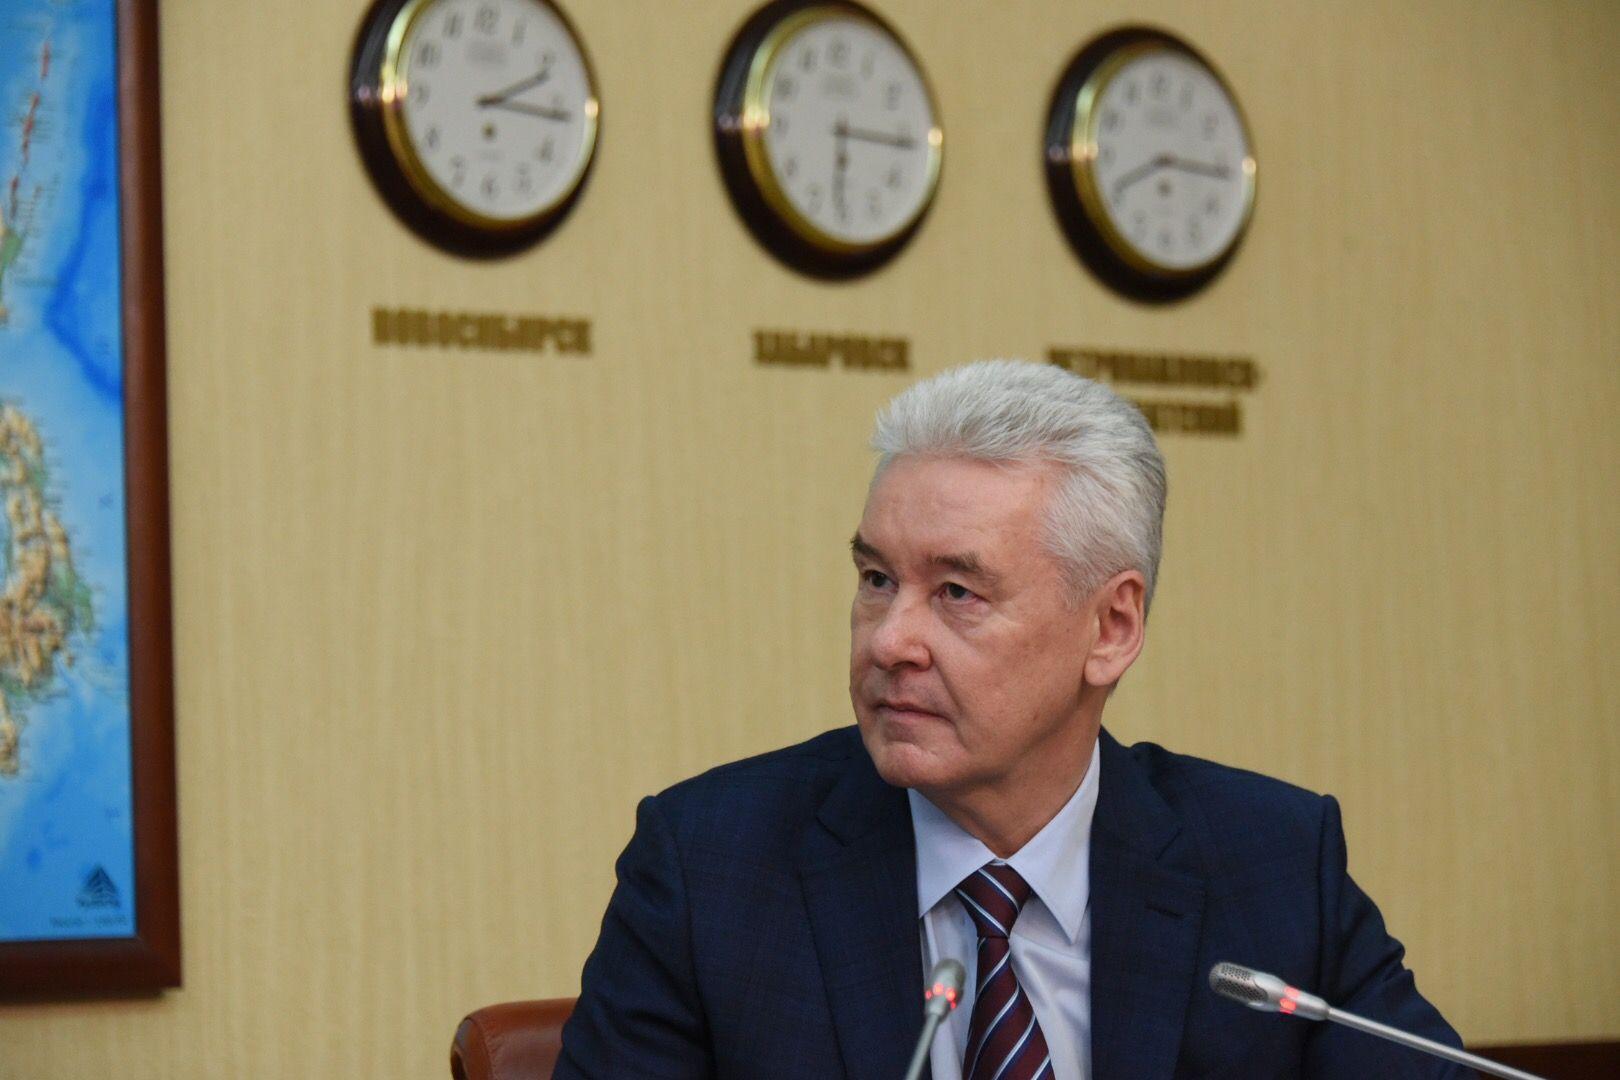 Собянин объявил о массовом тестировании москвичей на антитела кCOVID-19